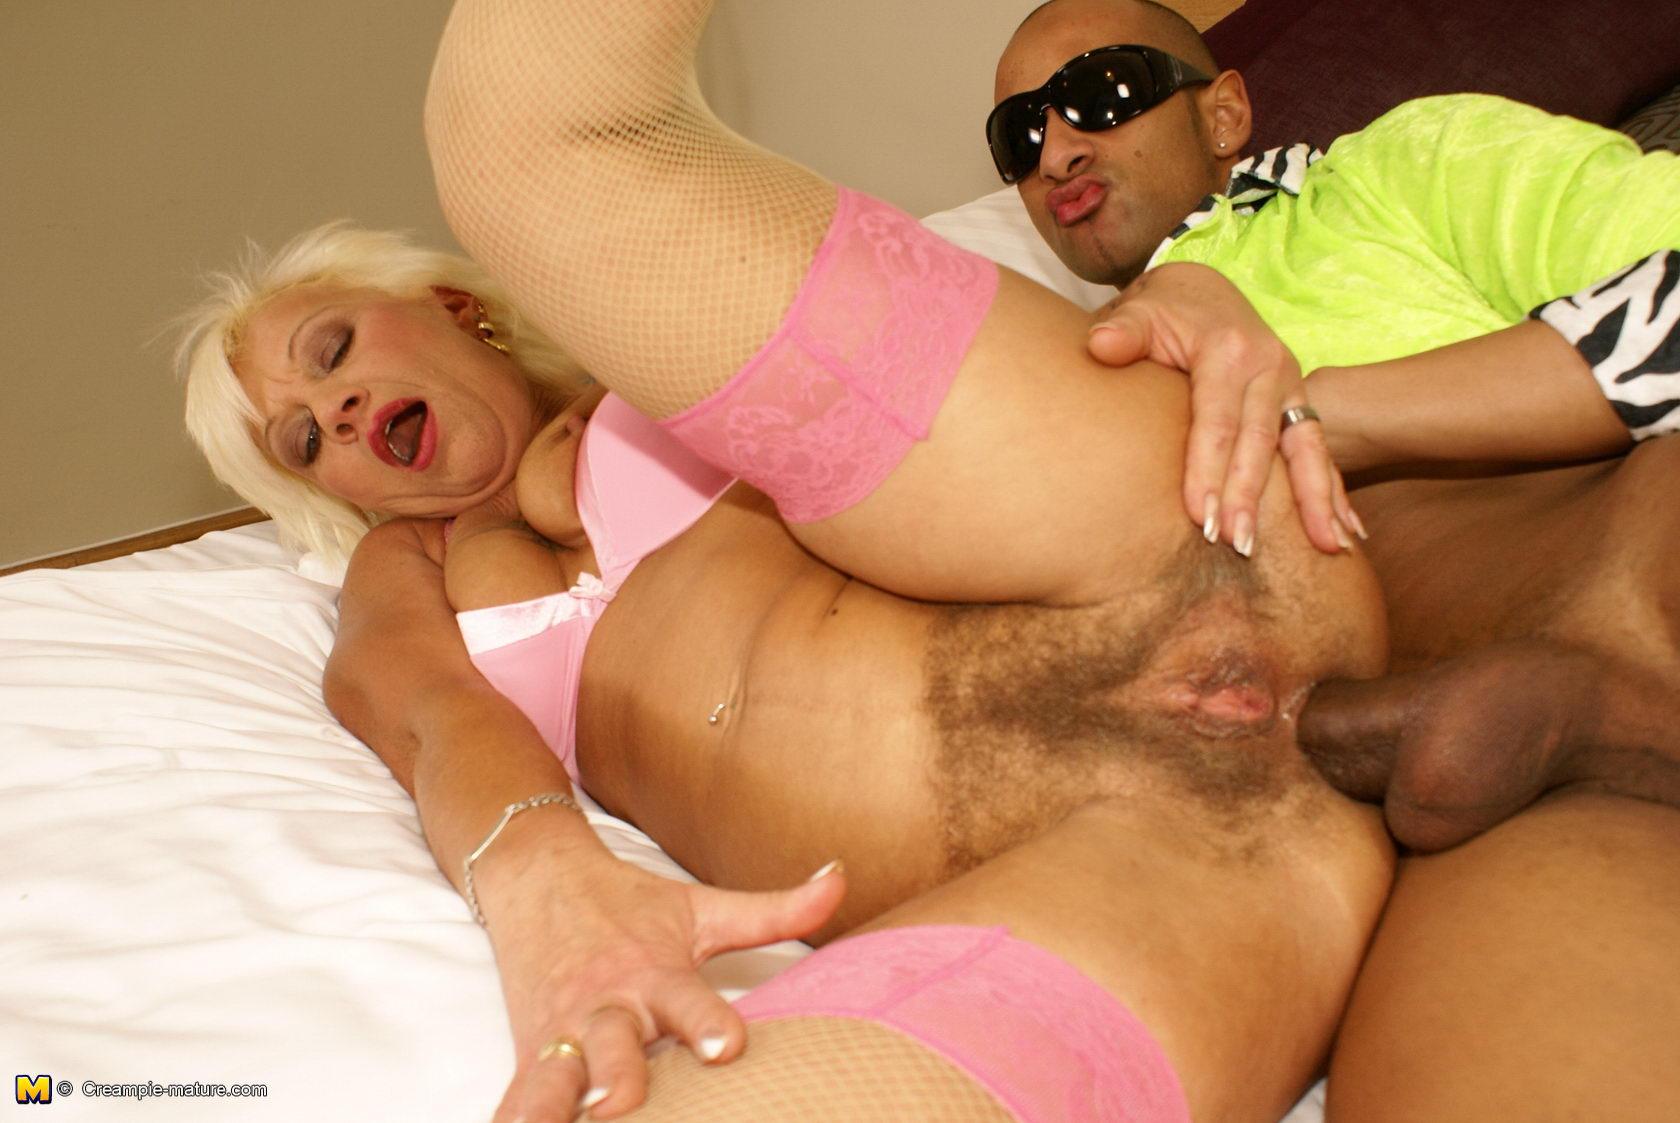 анал бабка порно смотреть онлайн фото